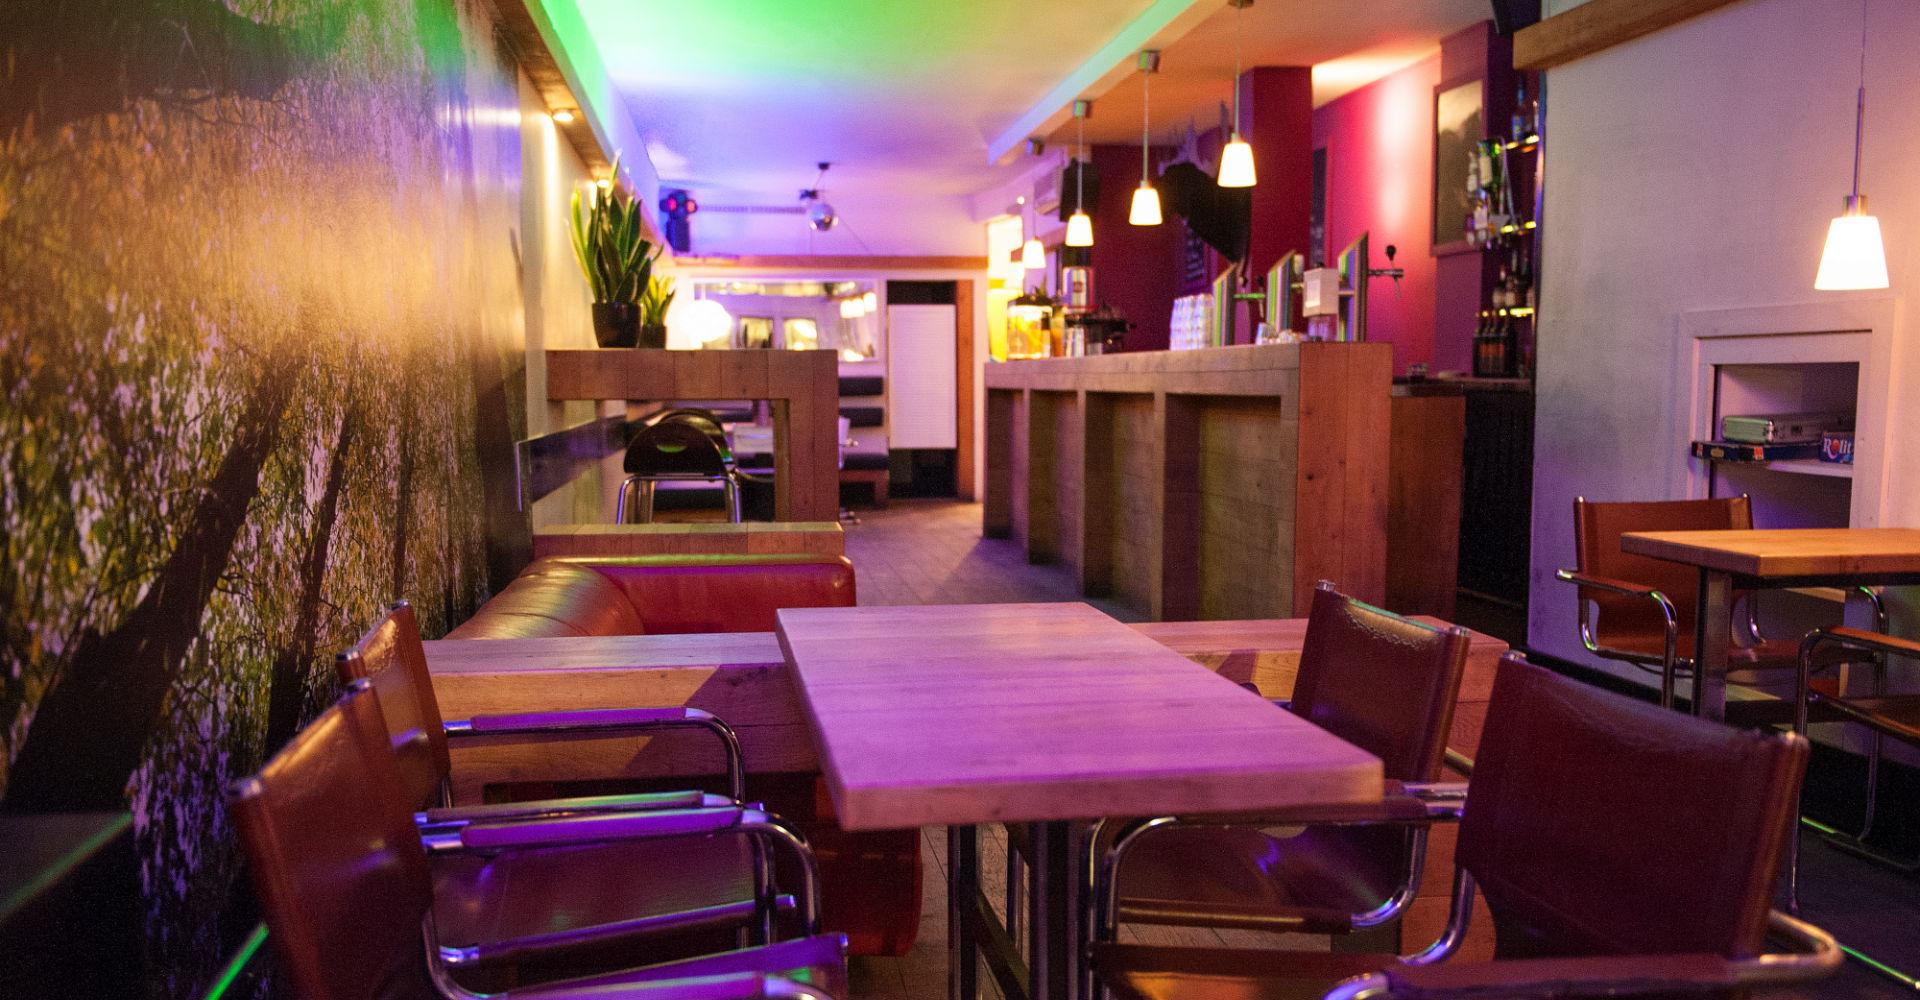 Welkom bij Stockholm Café